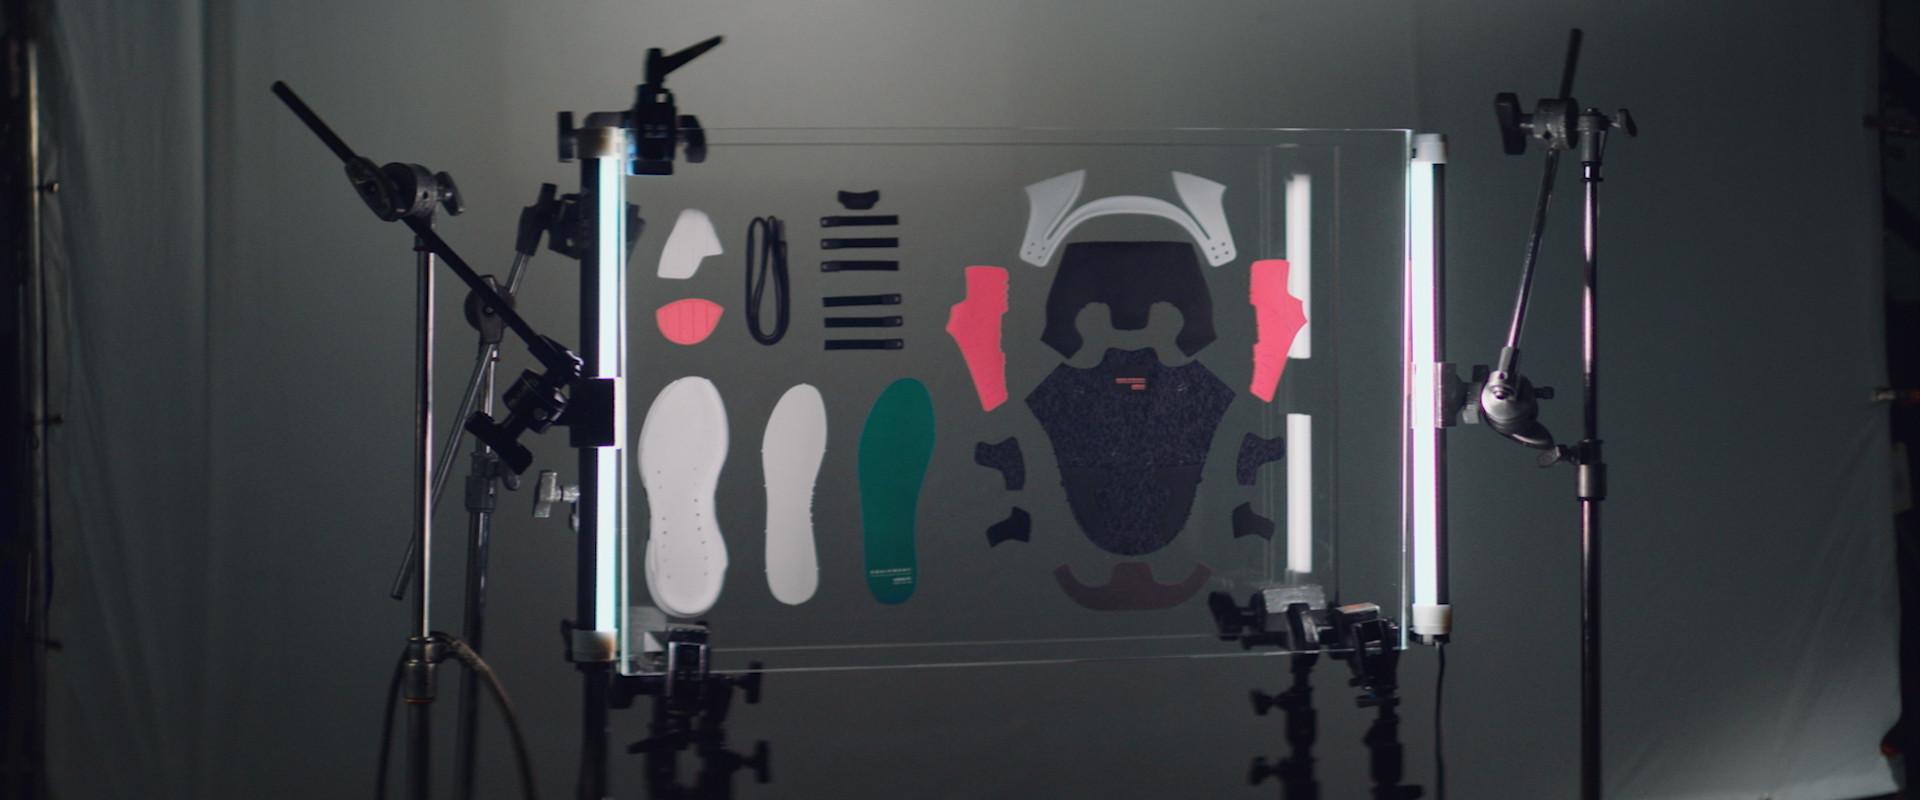 Adidas EQT ProRes 422 HQ Still004.jpg